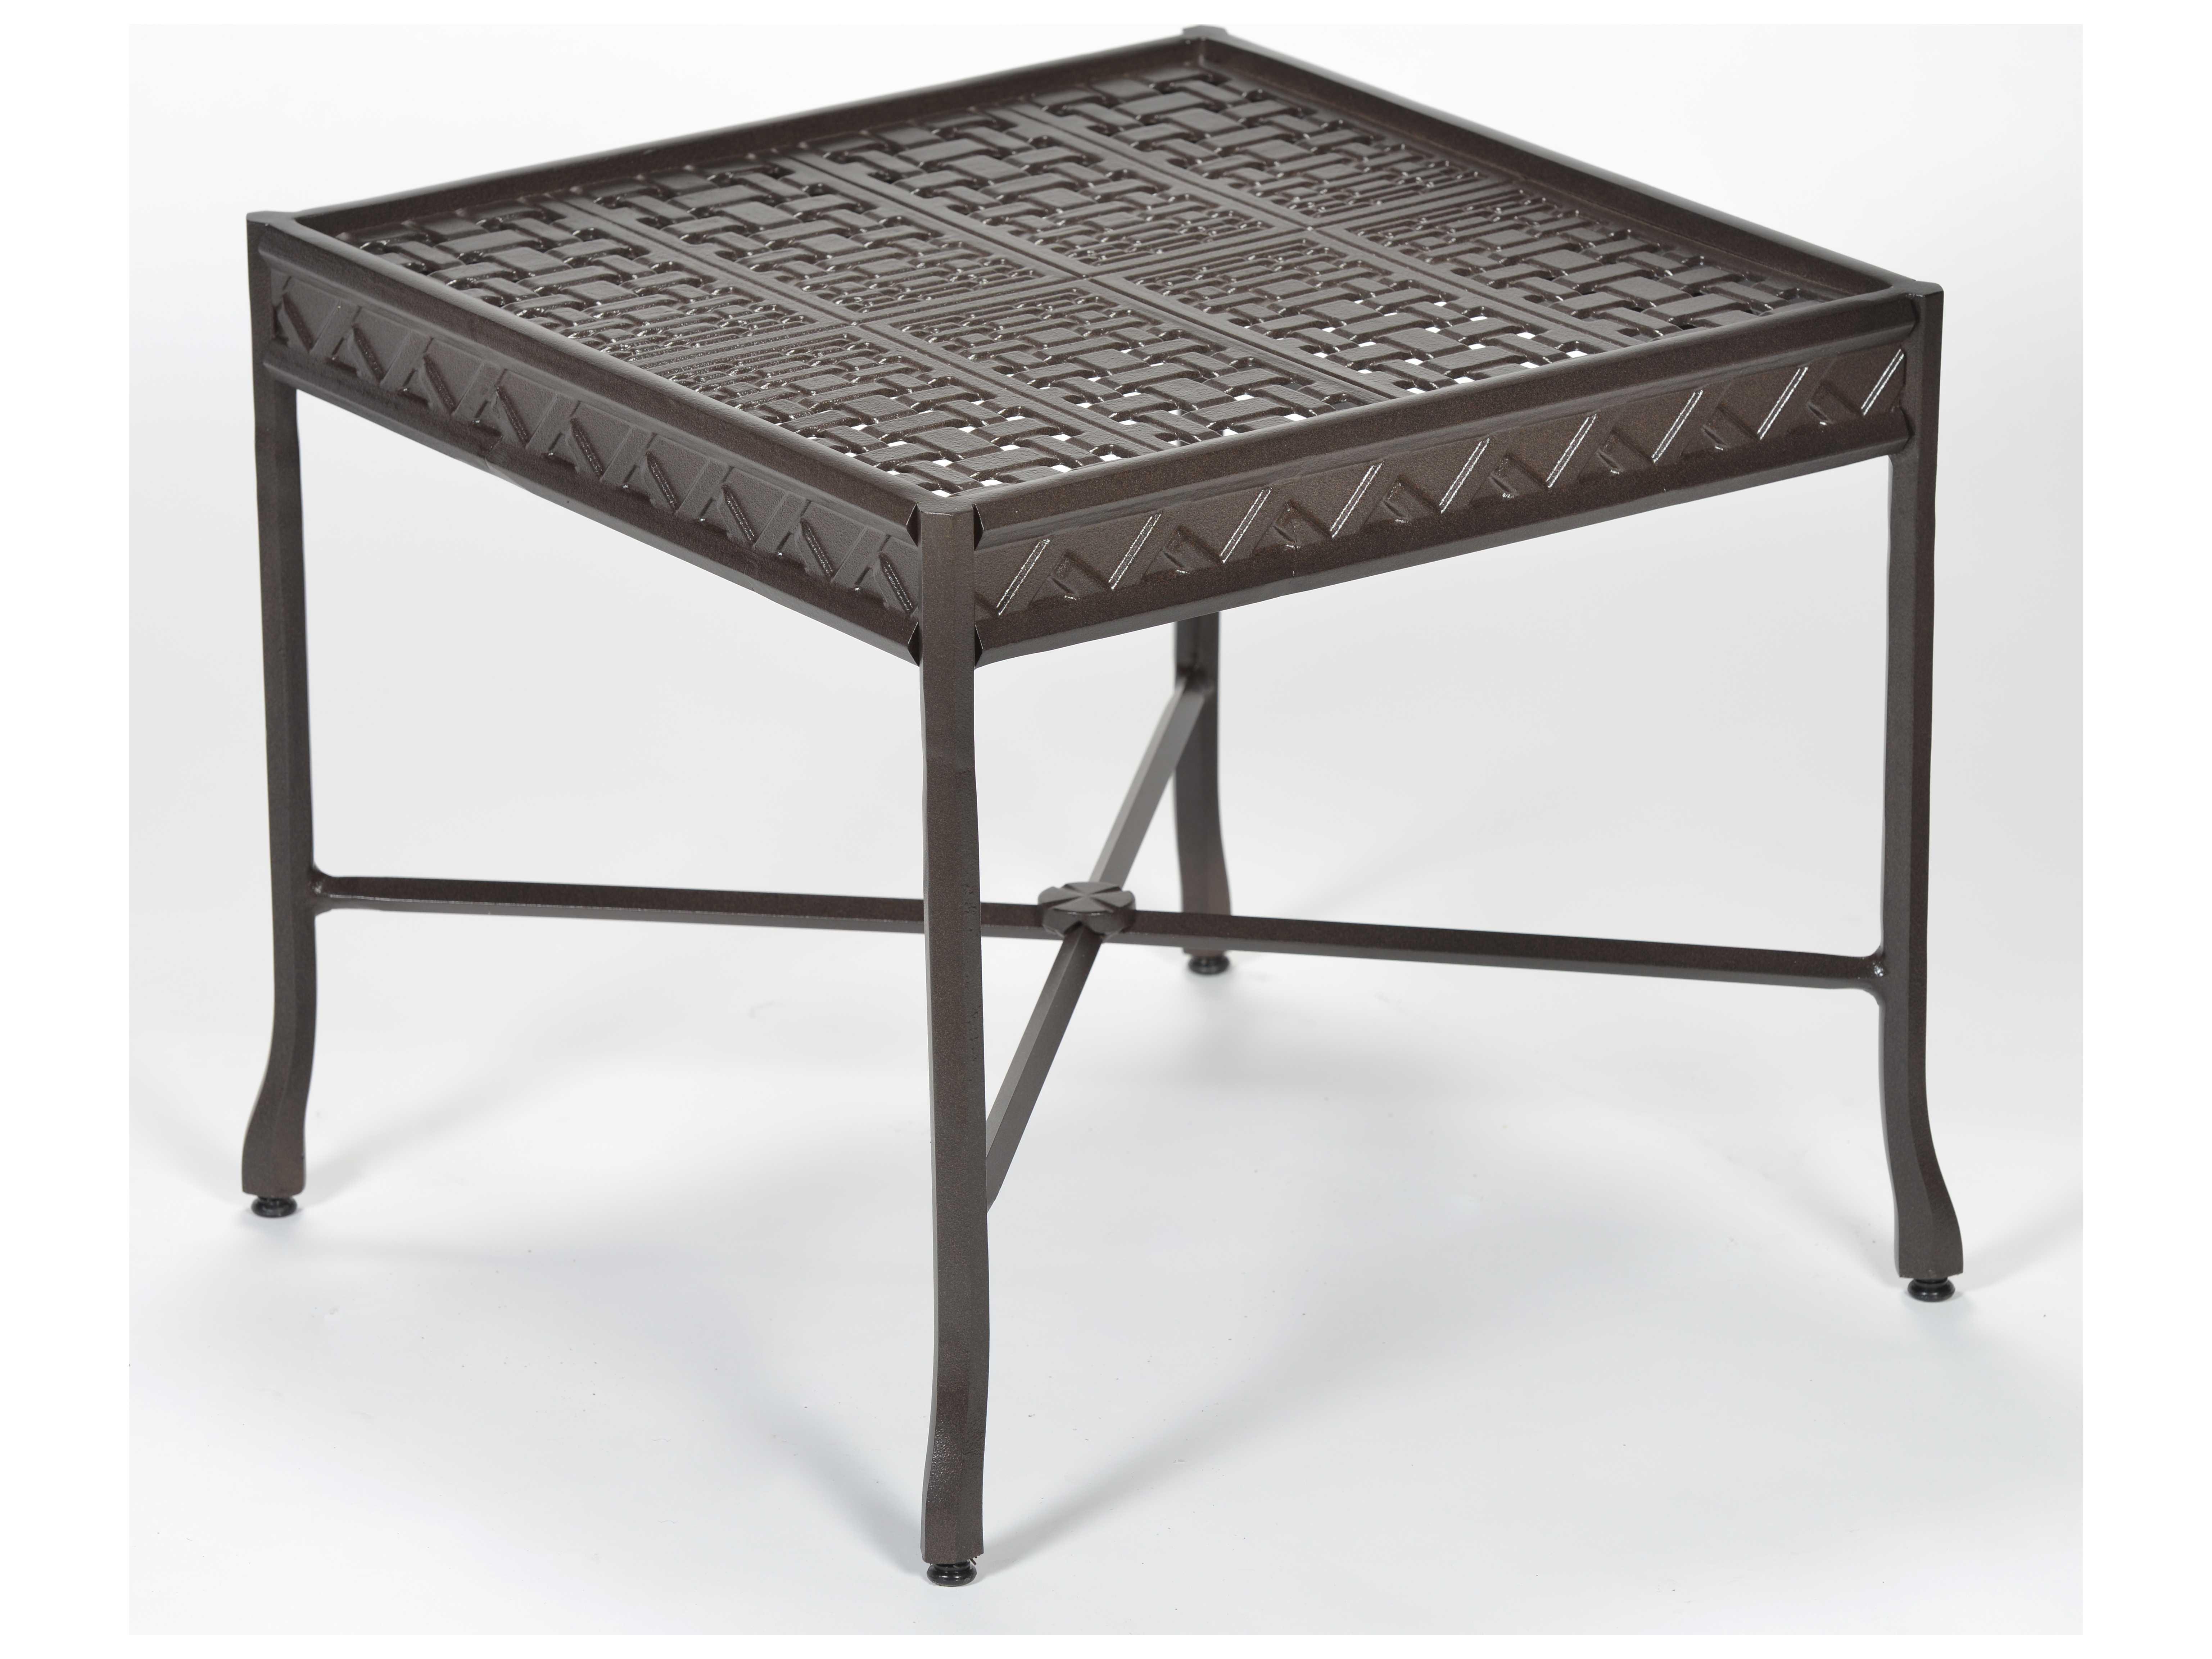 Windham Castings Savannah Cast Aluminum 22 39 39 Square Coffee Table 1420